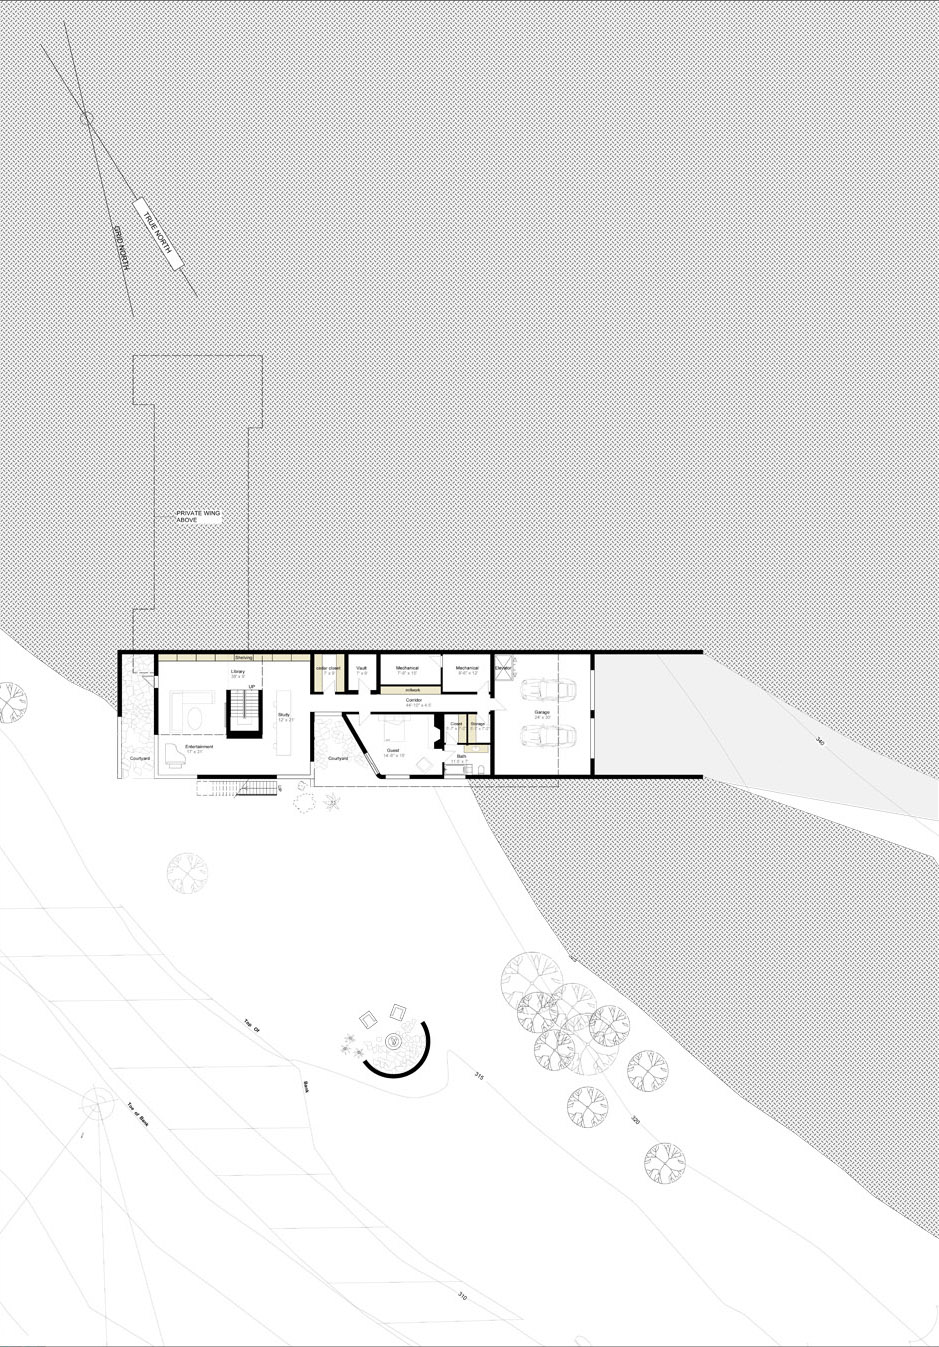 houdinidesign_ARCHITECTS_Process_Concept_Plan_03.jpg